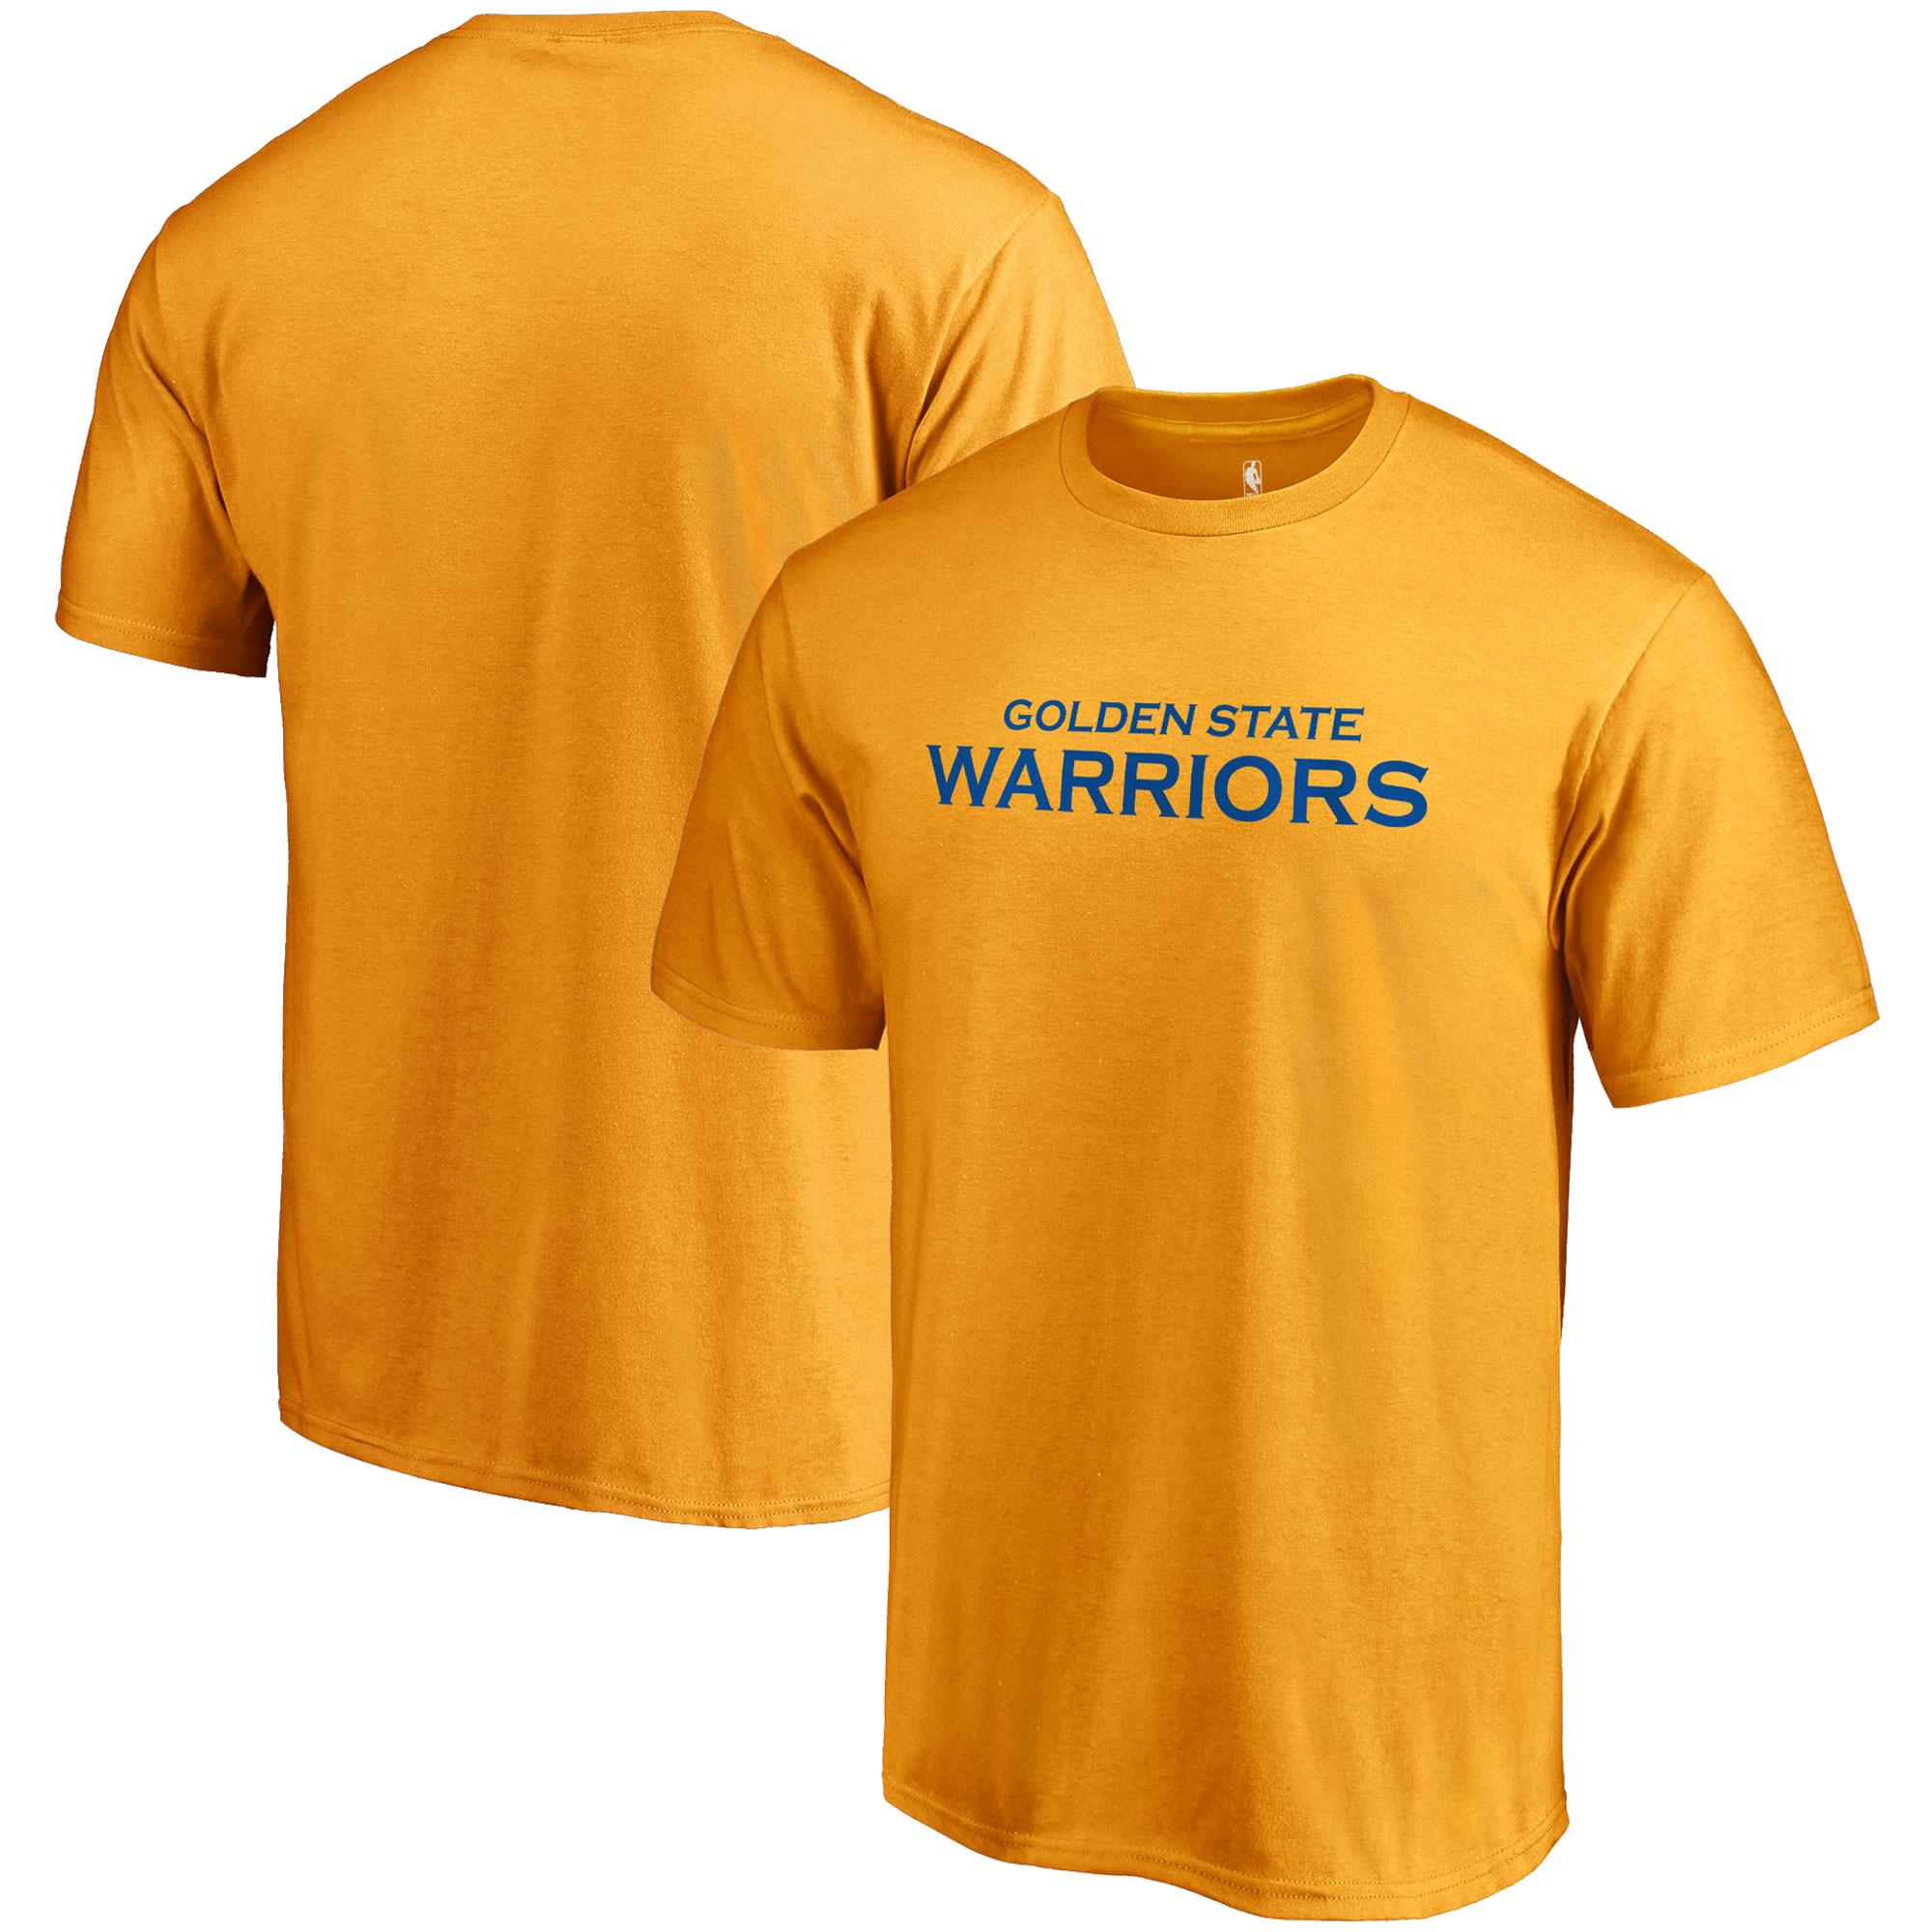 Golden State Warriors Fanatics Branded Primary Wordmark T-Shirt - Gold